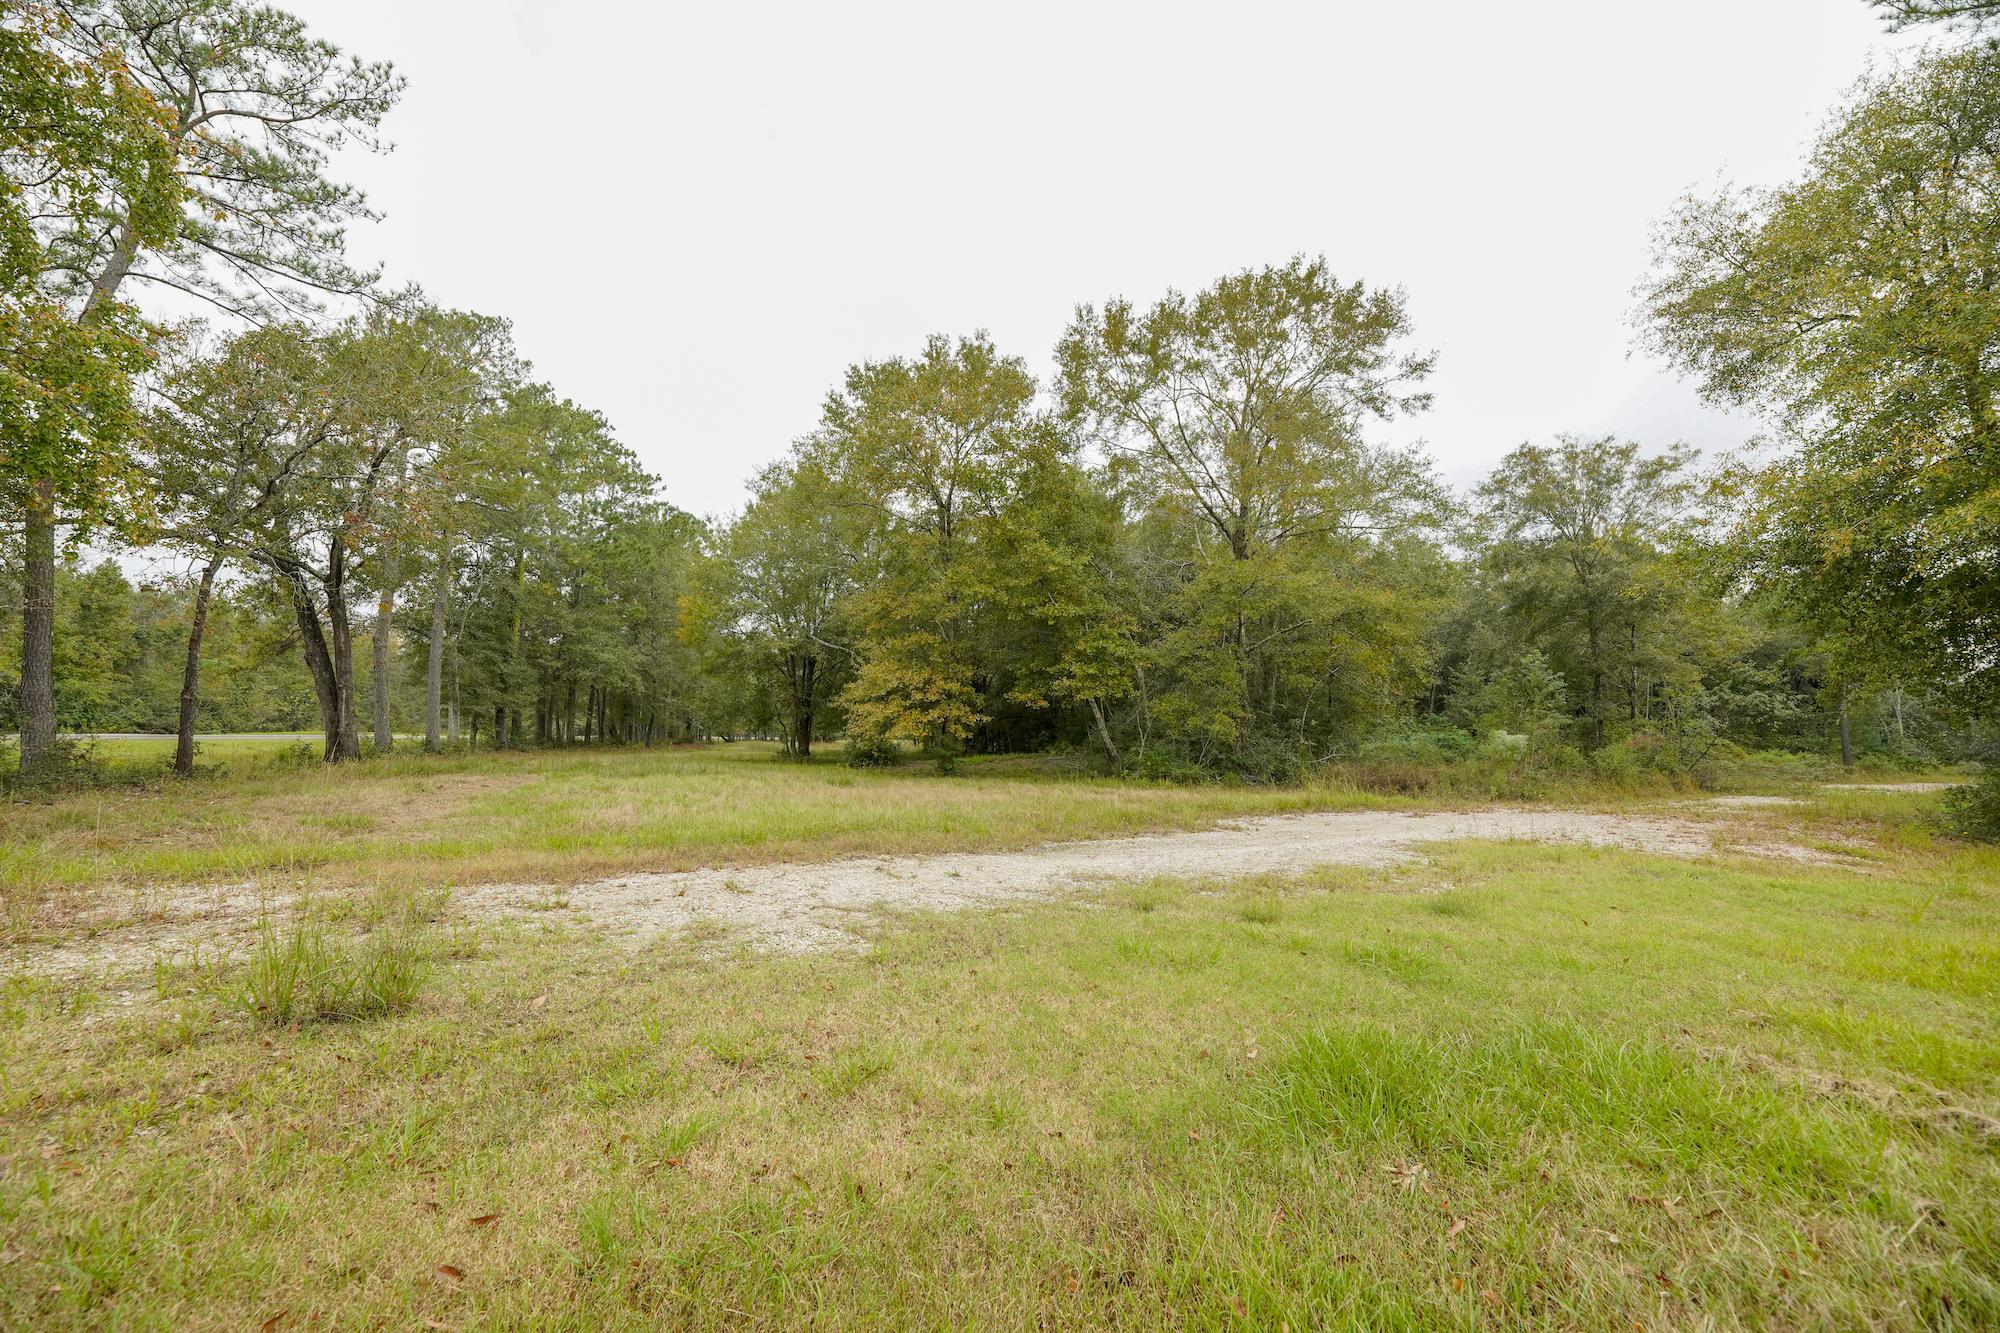 Jefferson County Development Land - Image 33 of 36